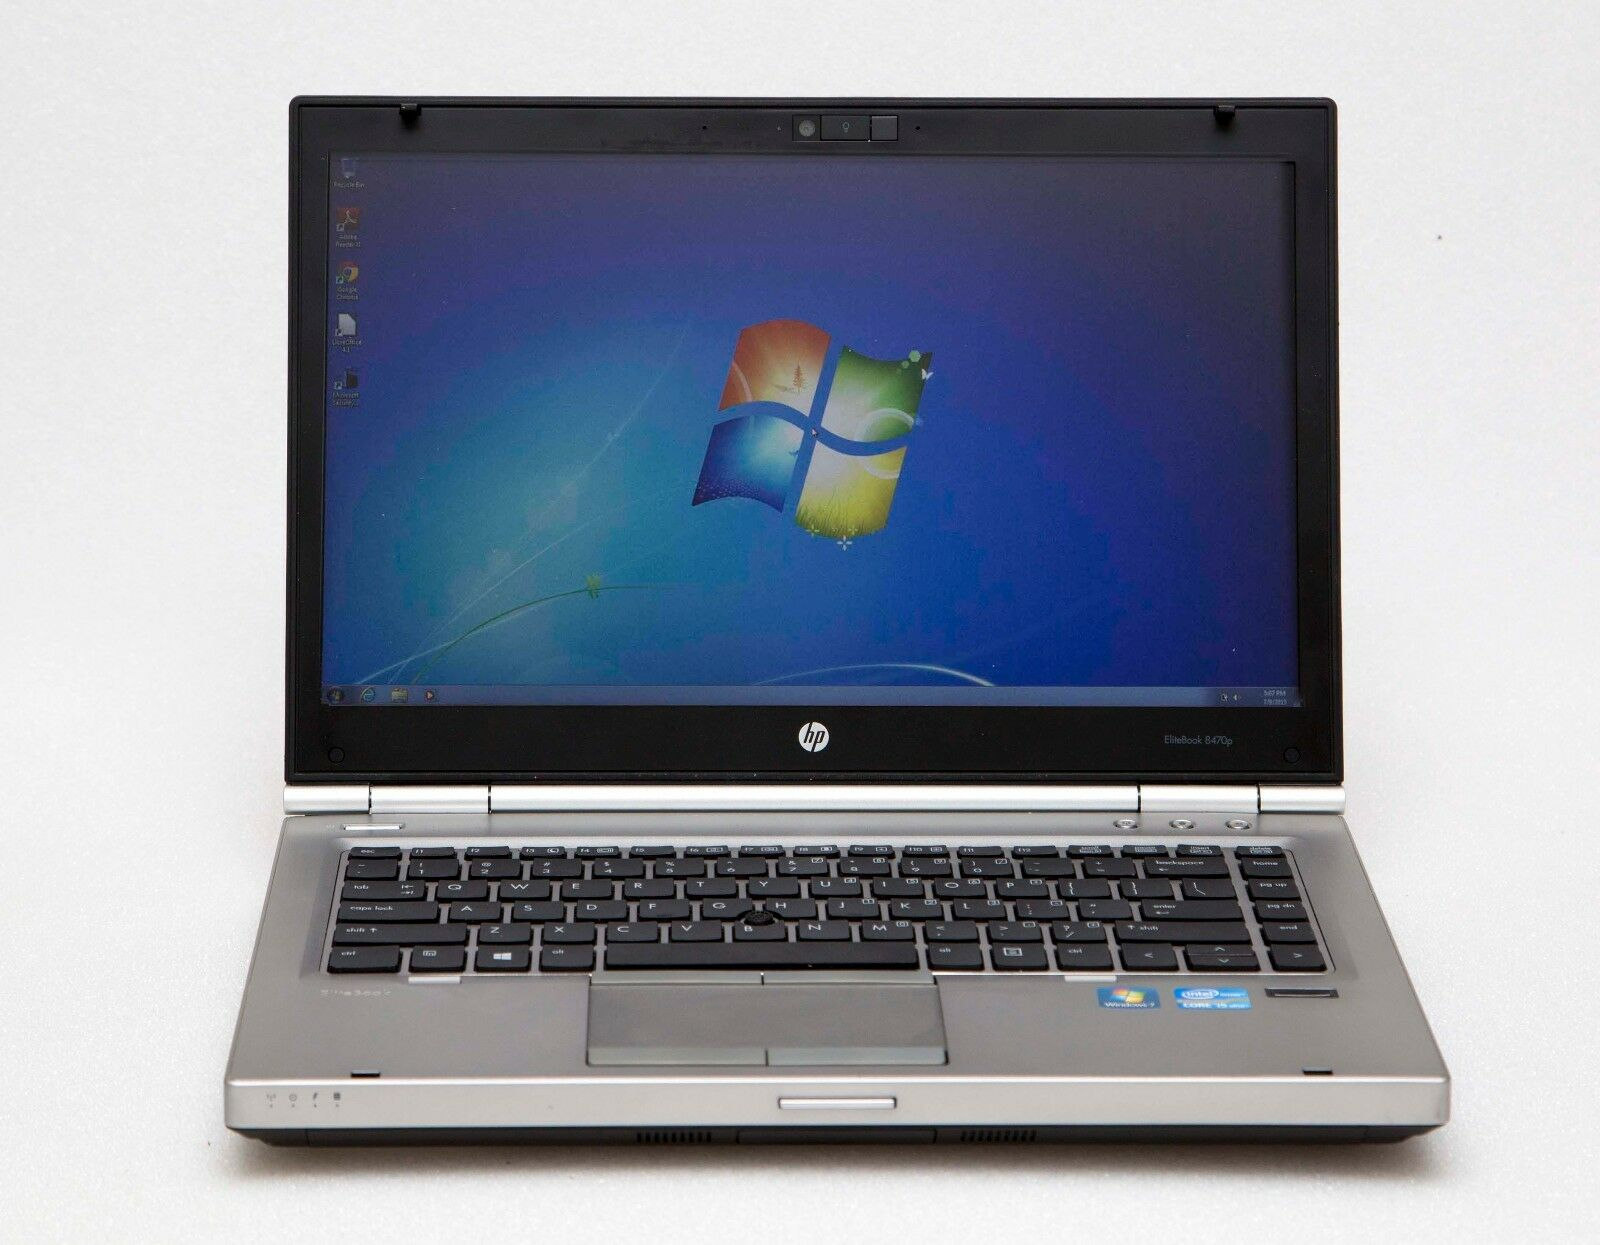 "HP EliteBook 8470p 14"" Core i5-3320M 2.6GHz 8GB 256GB SSD 1600x900 Win 7 Laptop"